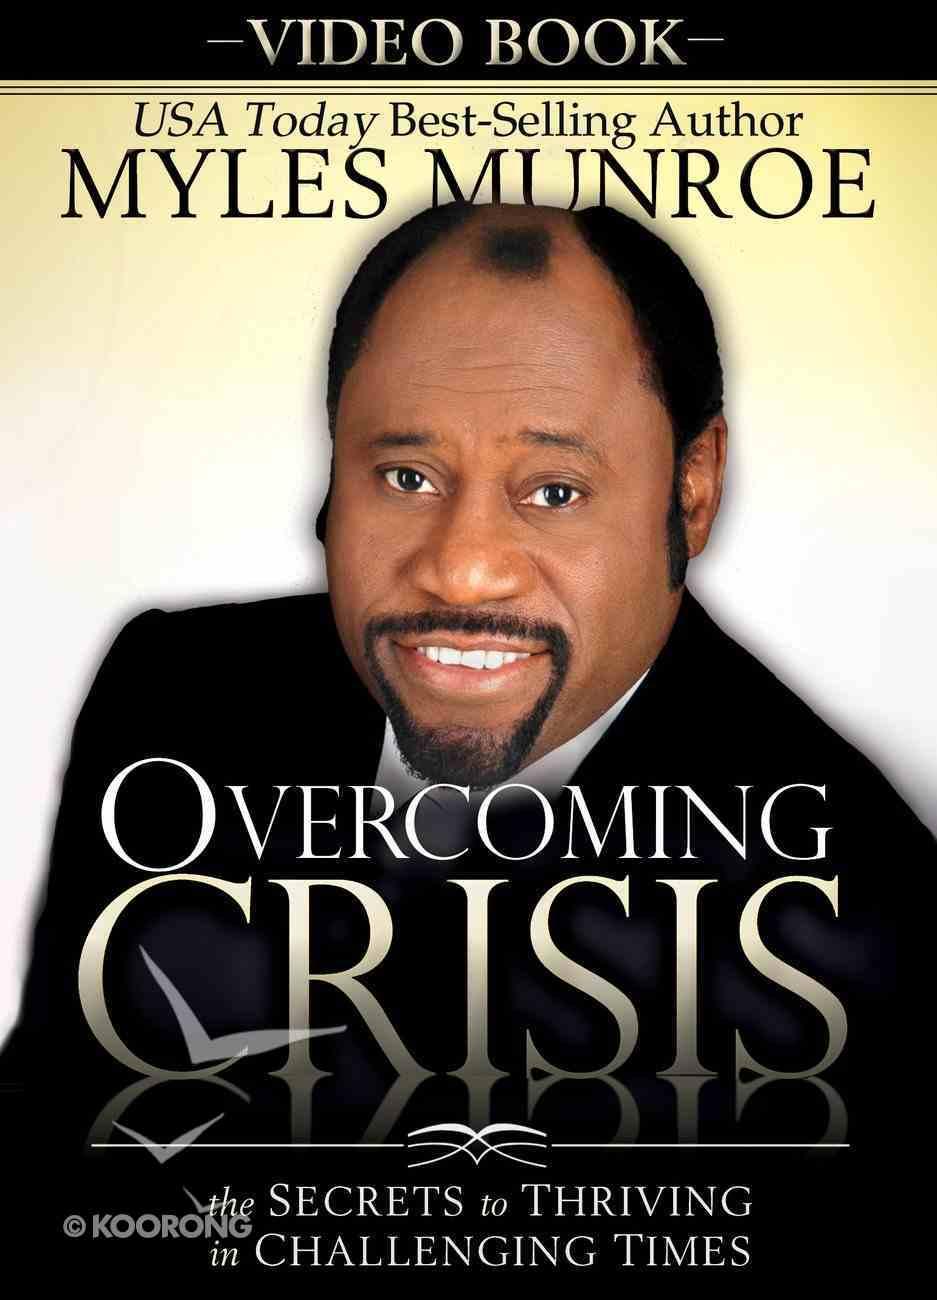 Overcoming Crisis DVD